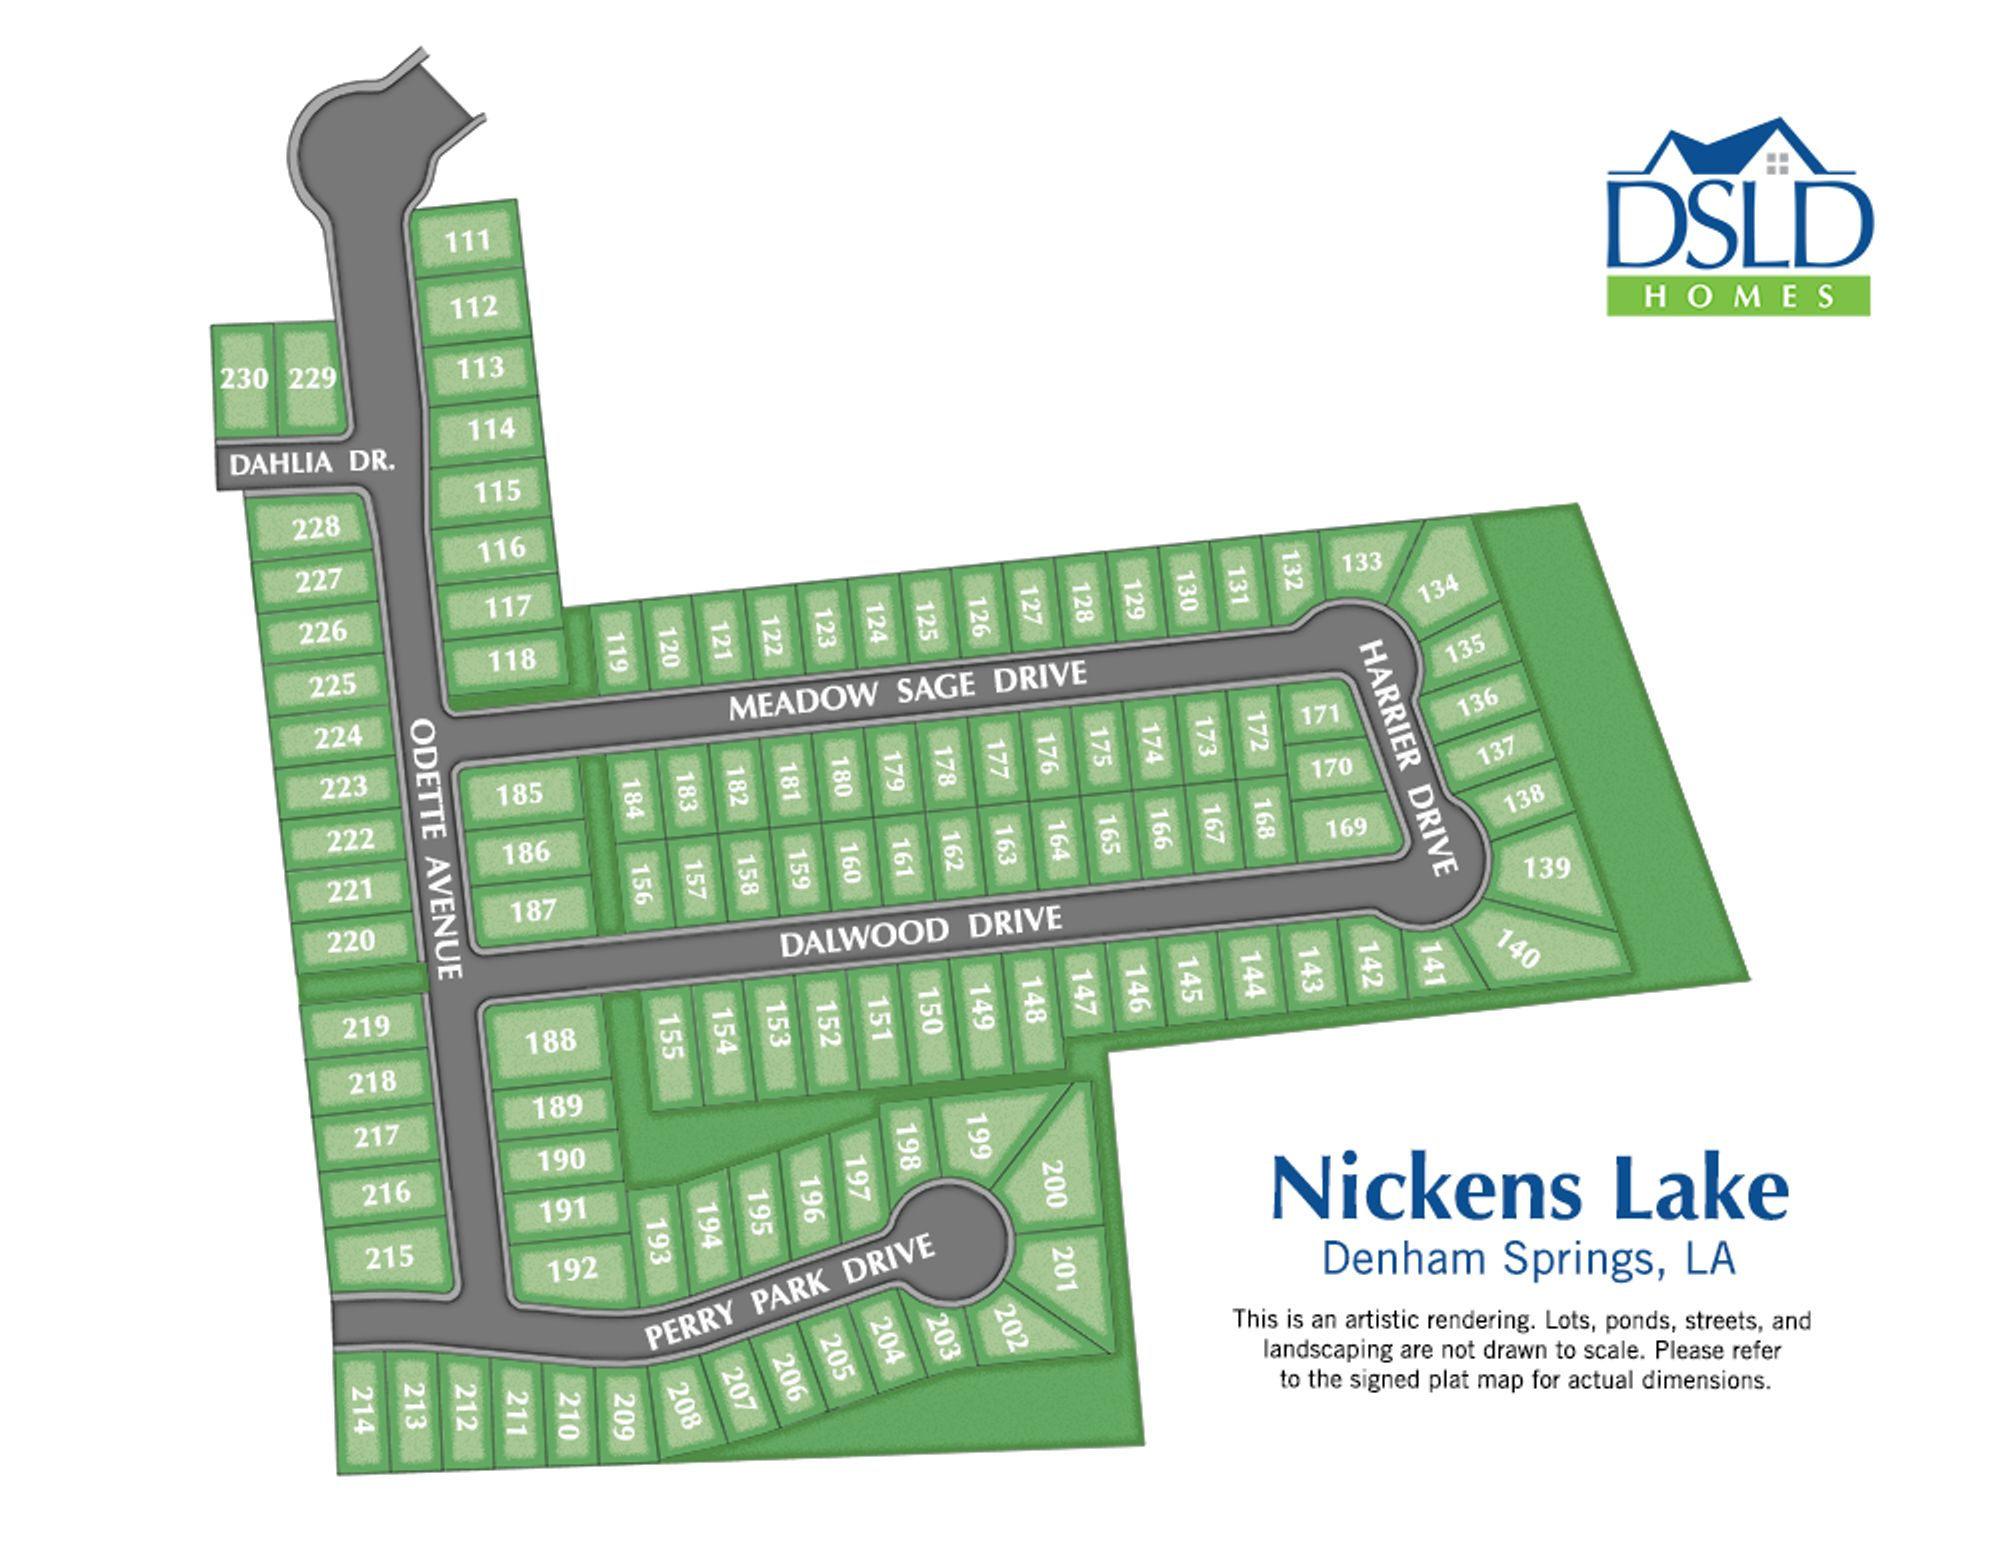 Nickens Lake